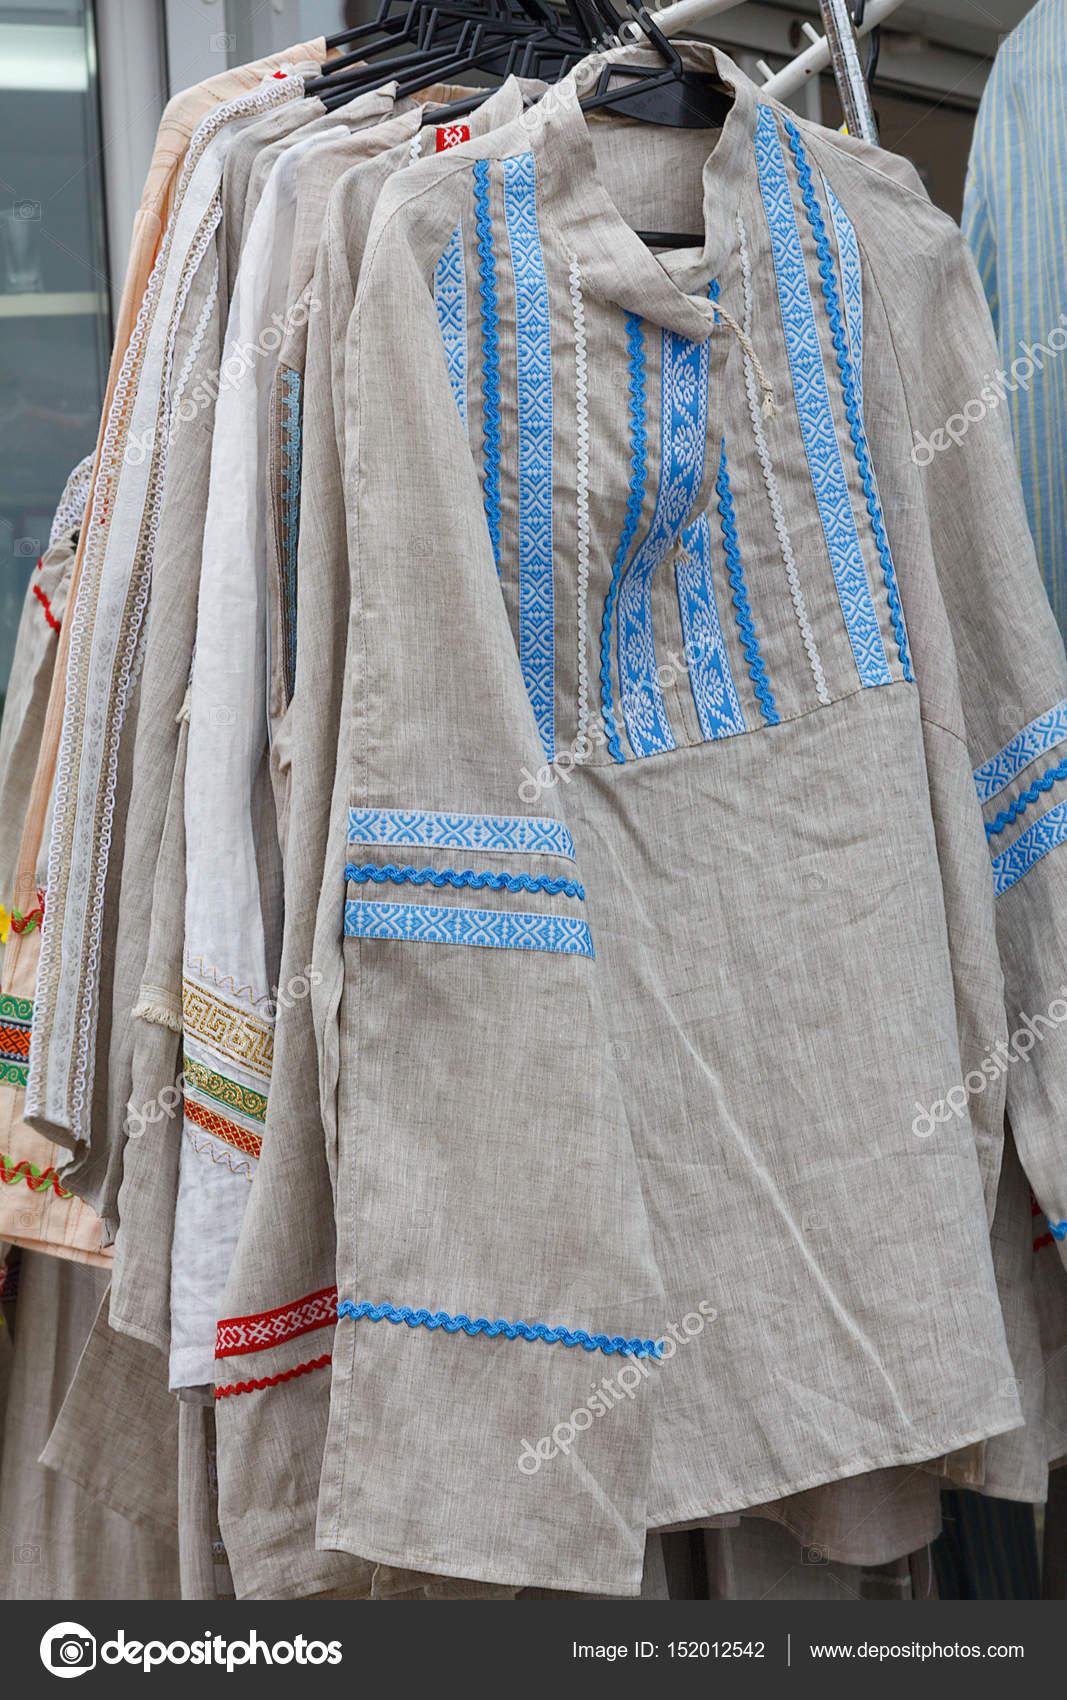 44aa39e43d8d Εθνική Λευκορωσίας λινά ρούχα κρέμονται στις κρεμάστρες. Πουκάμισο από λινό  σε ρουστίκ στυλ